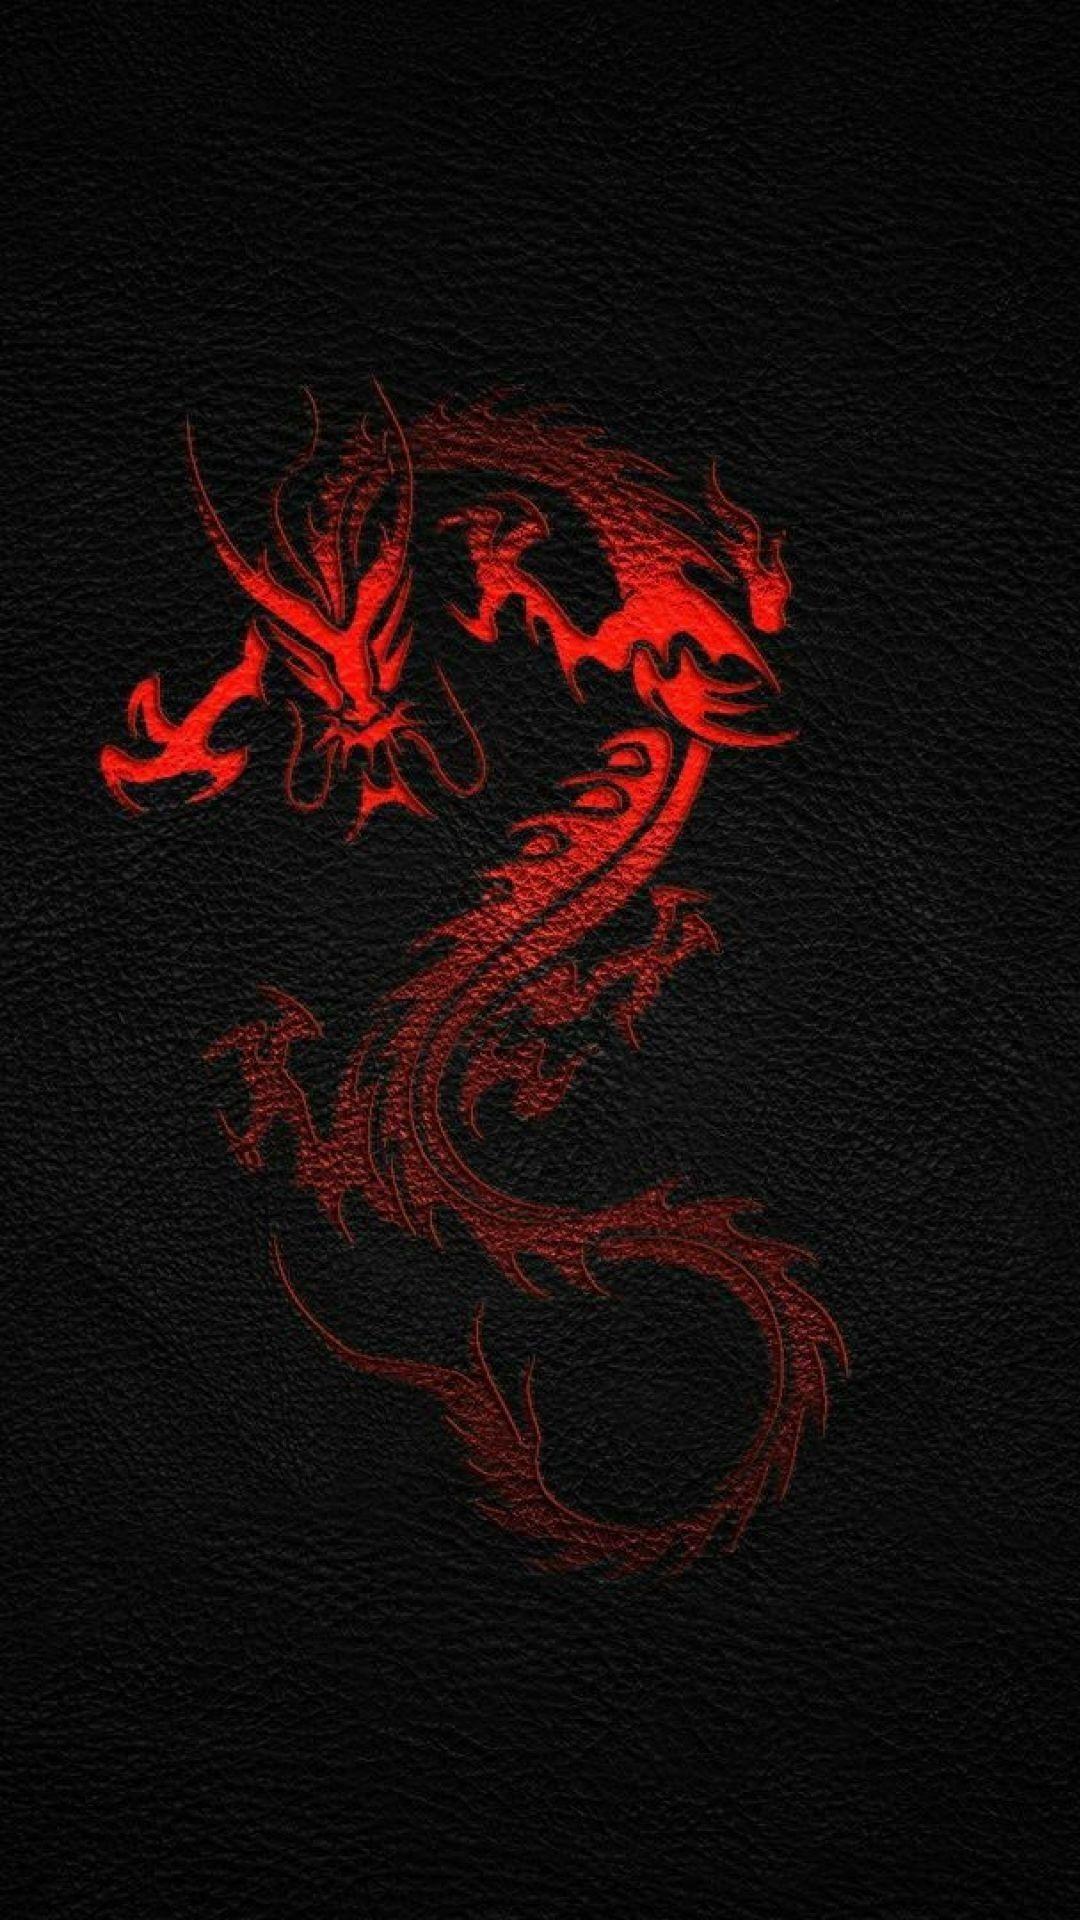 Dragon iphone 5 wallpaper